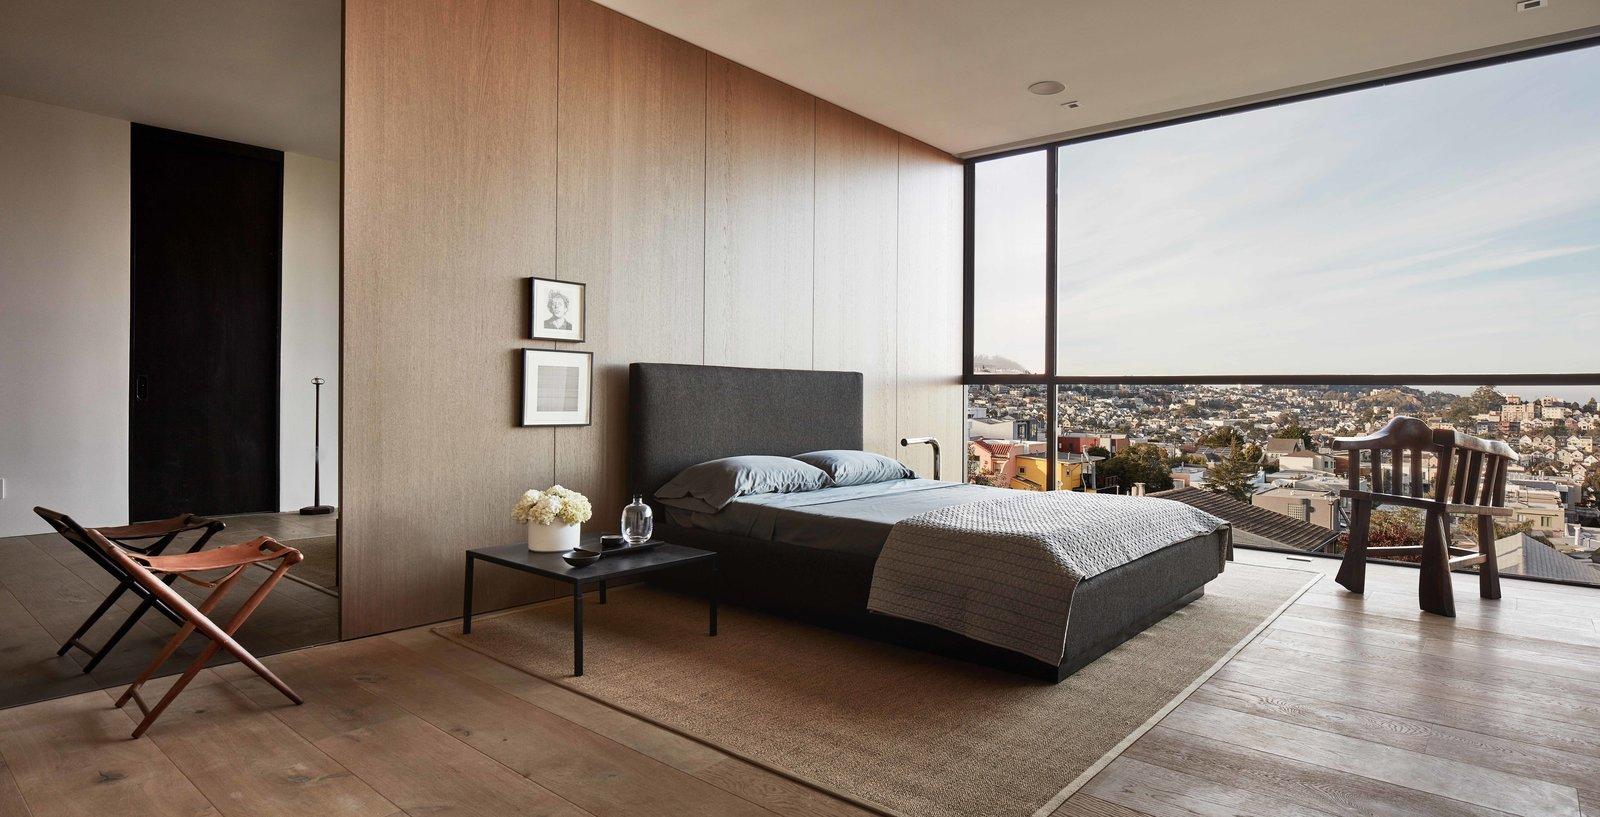 Bedroom  MAK Studio Noe Valley Residence